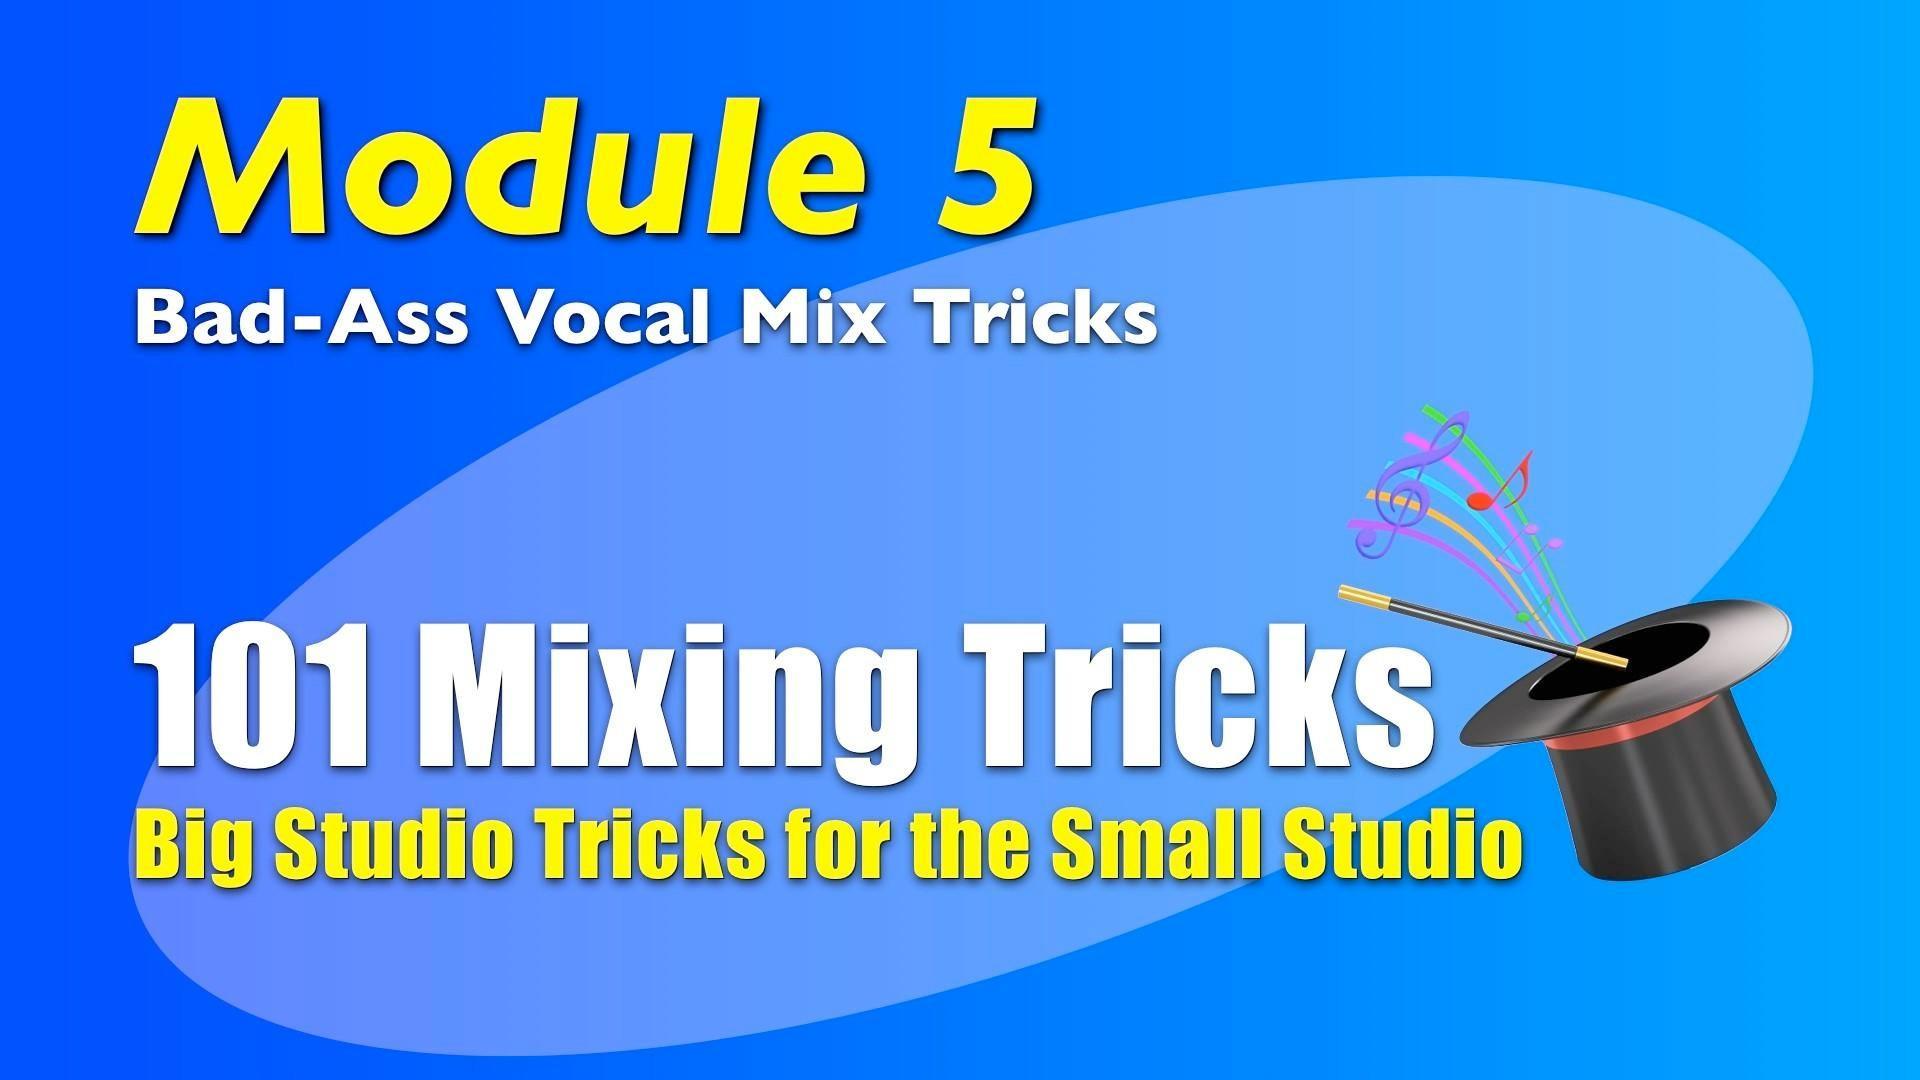 101 Mixing Tricks Module 5 title image